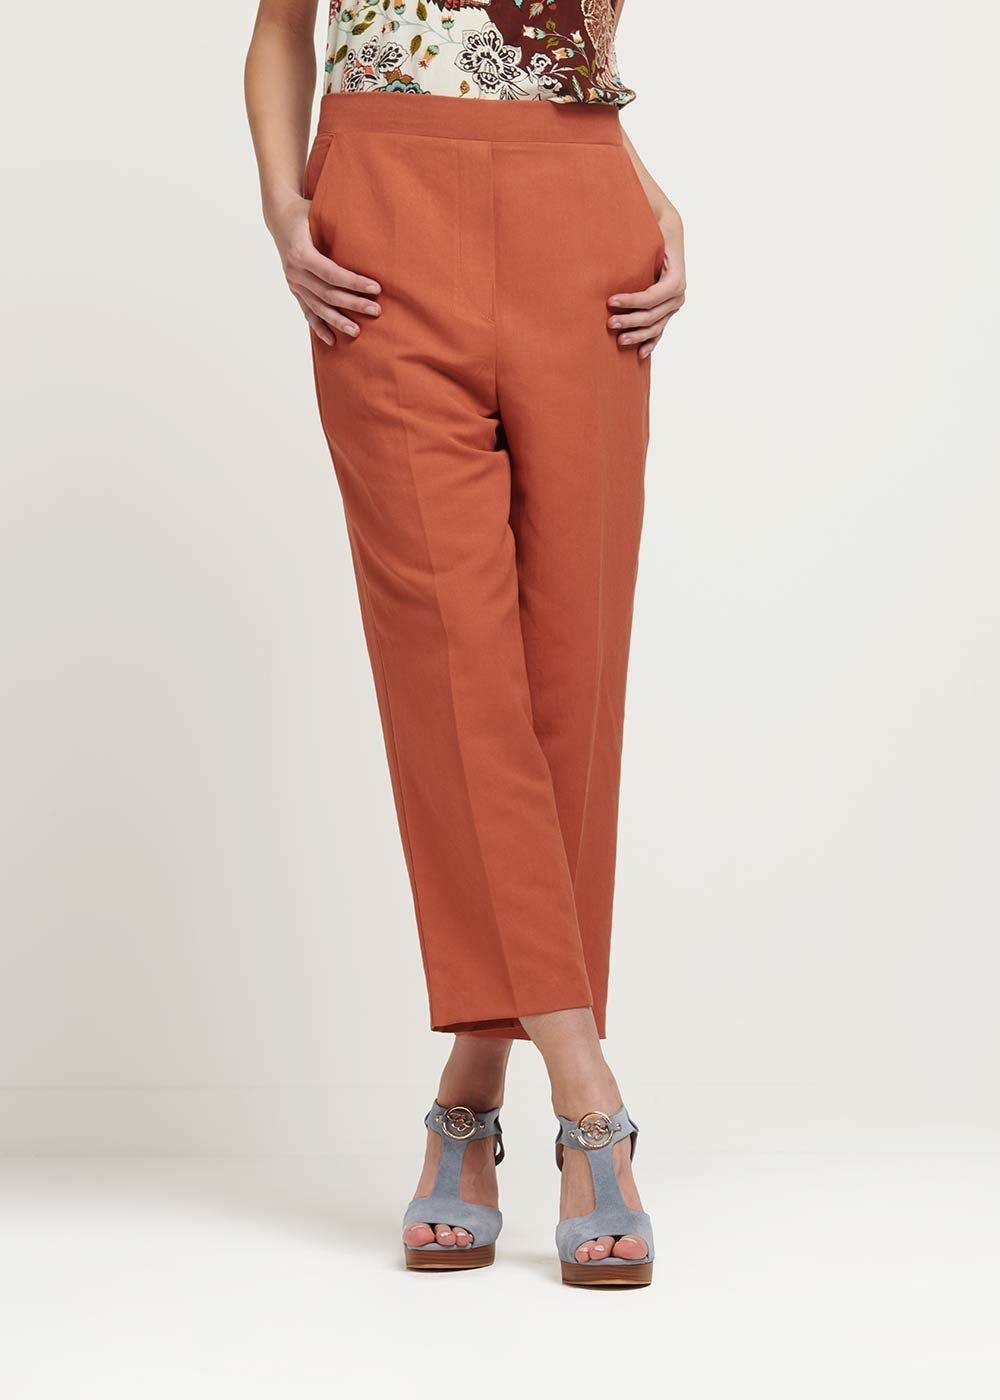 Megan cinnamon trousers - Cinnamon - Woman